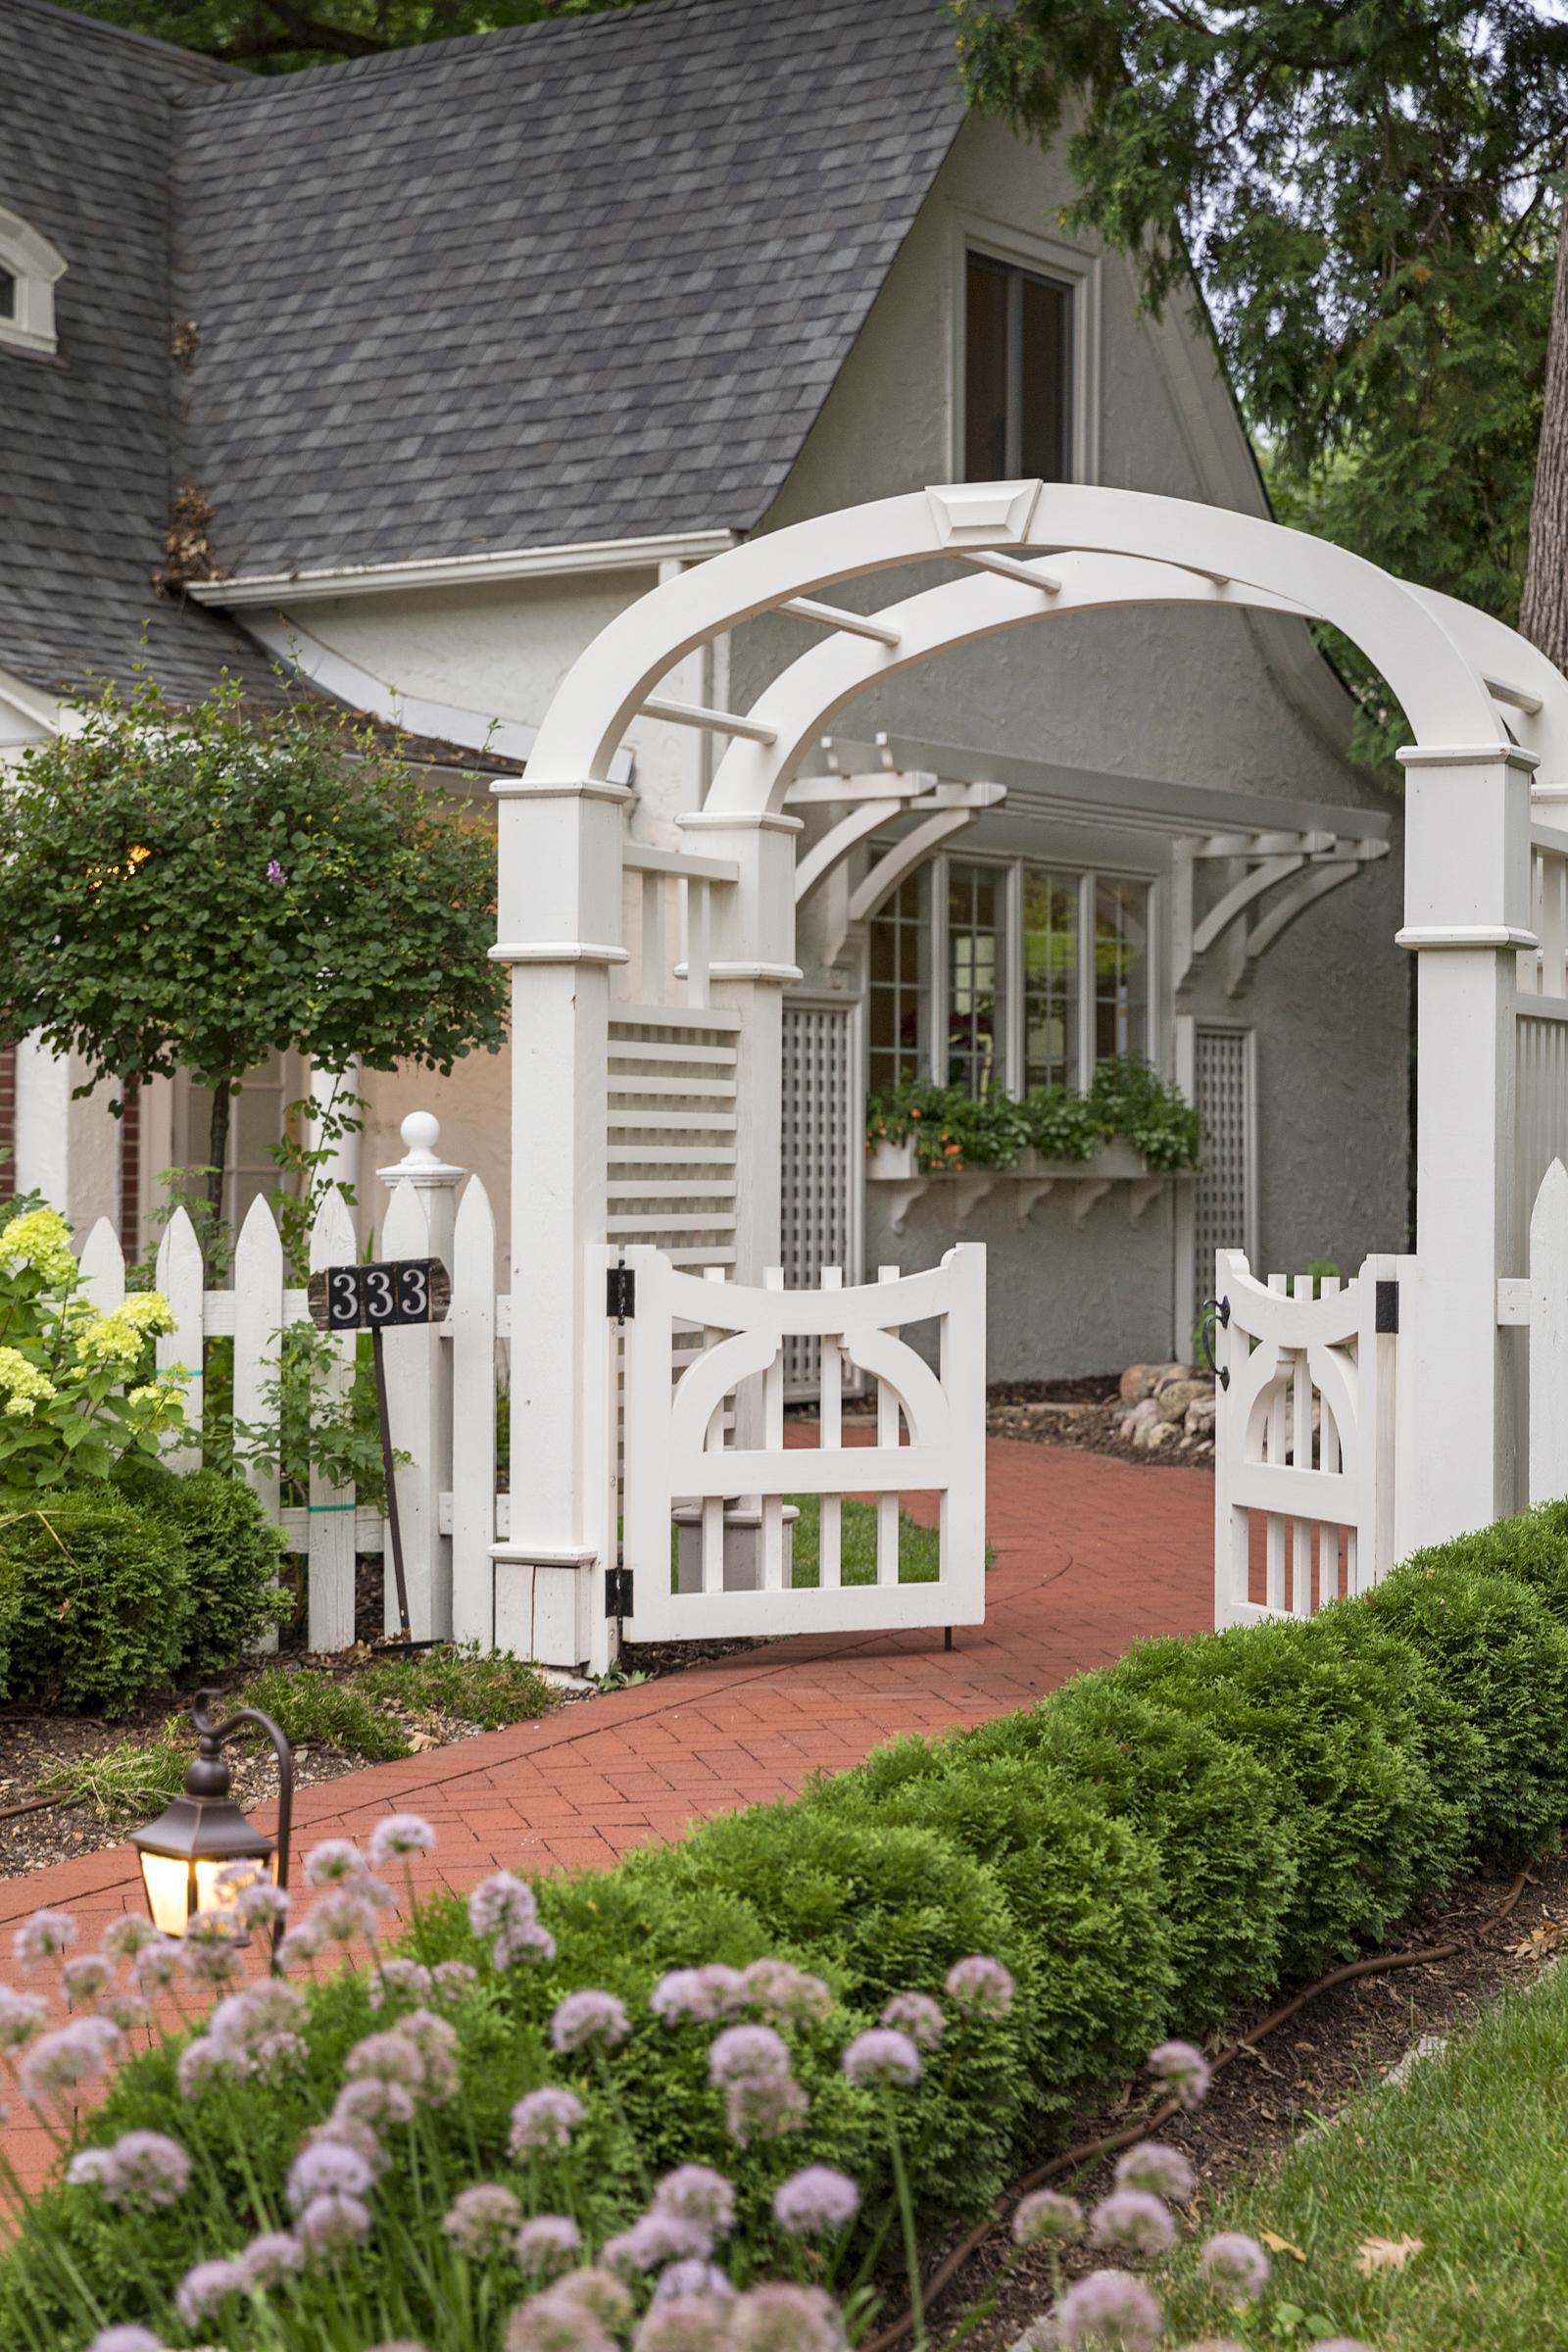 Mom's Design Build - White Fence Archway Pergola